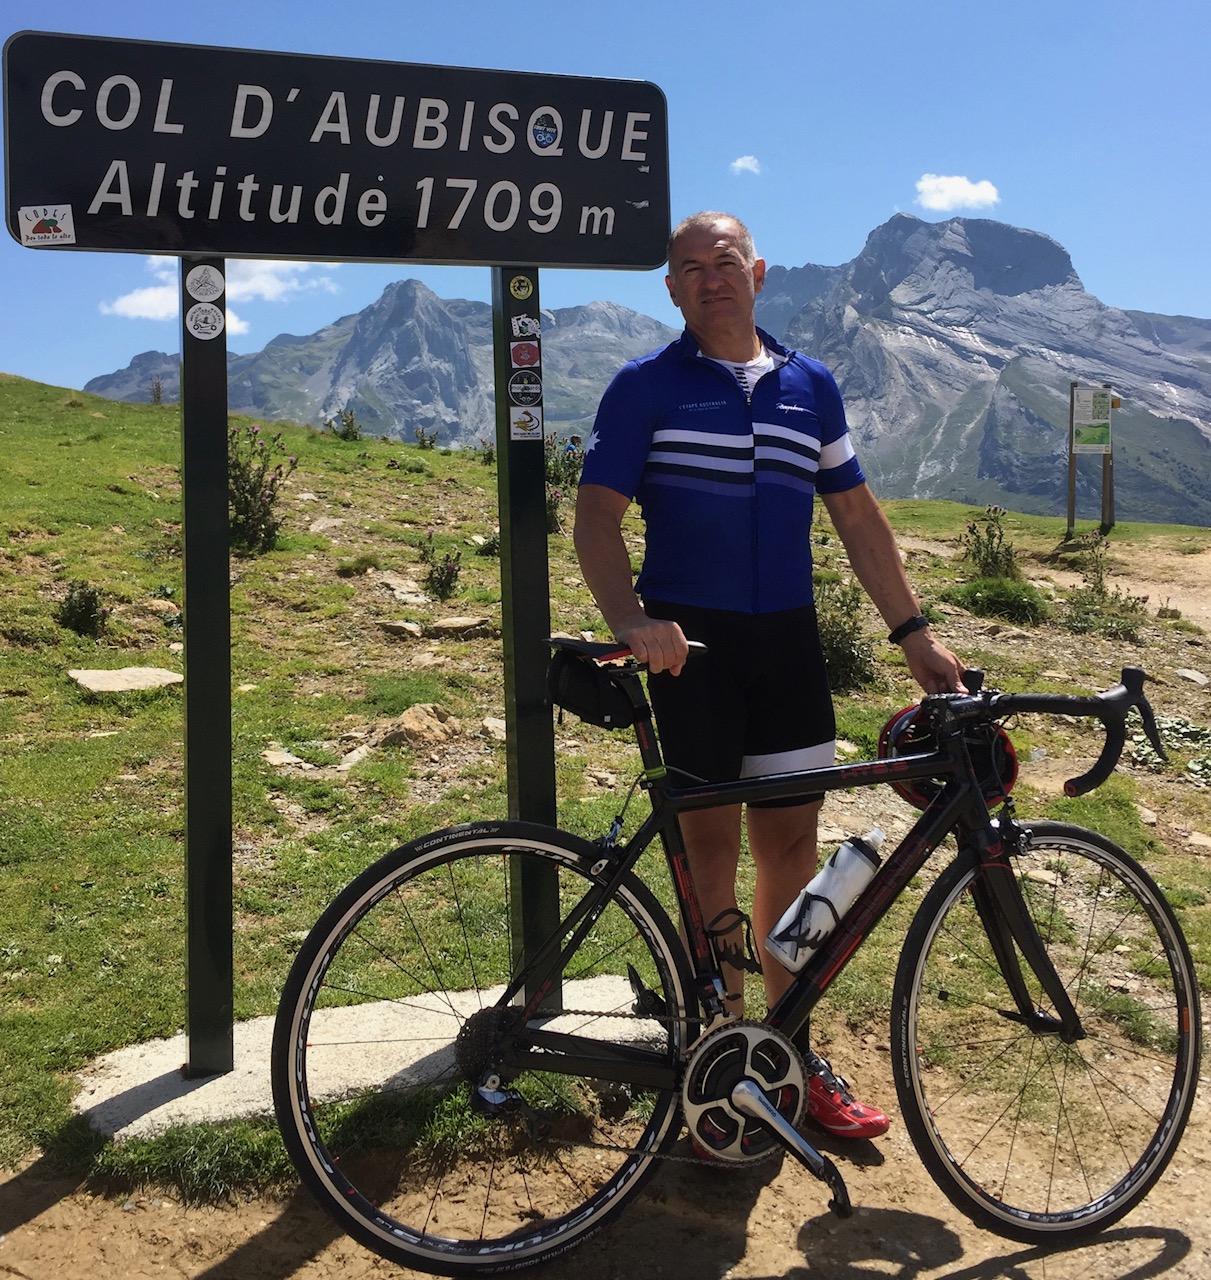 D'Aubisque 17 - Anthony Colantonio having already climbed the Col du Tourmalet then the Col D'Aubisque was next on the bucket list